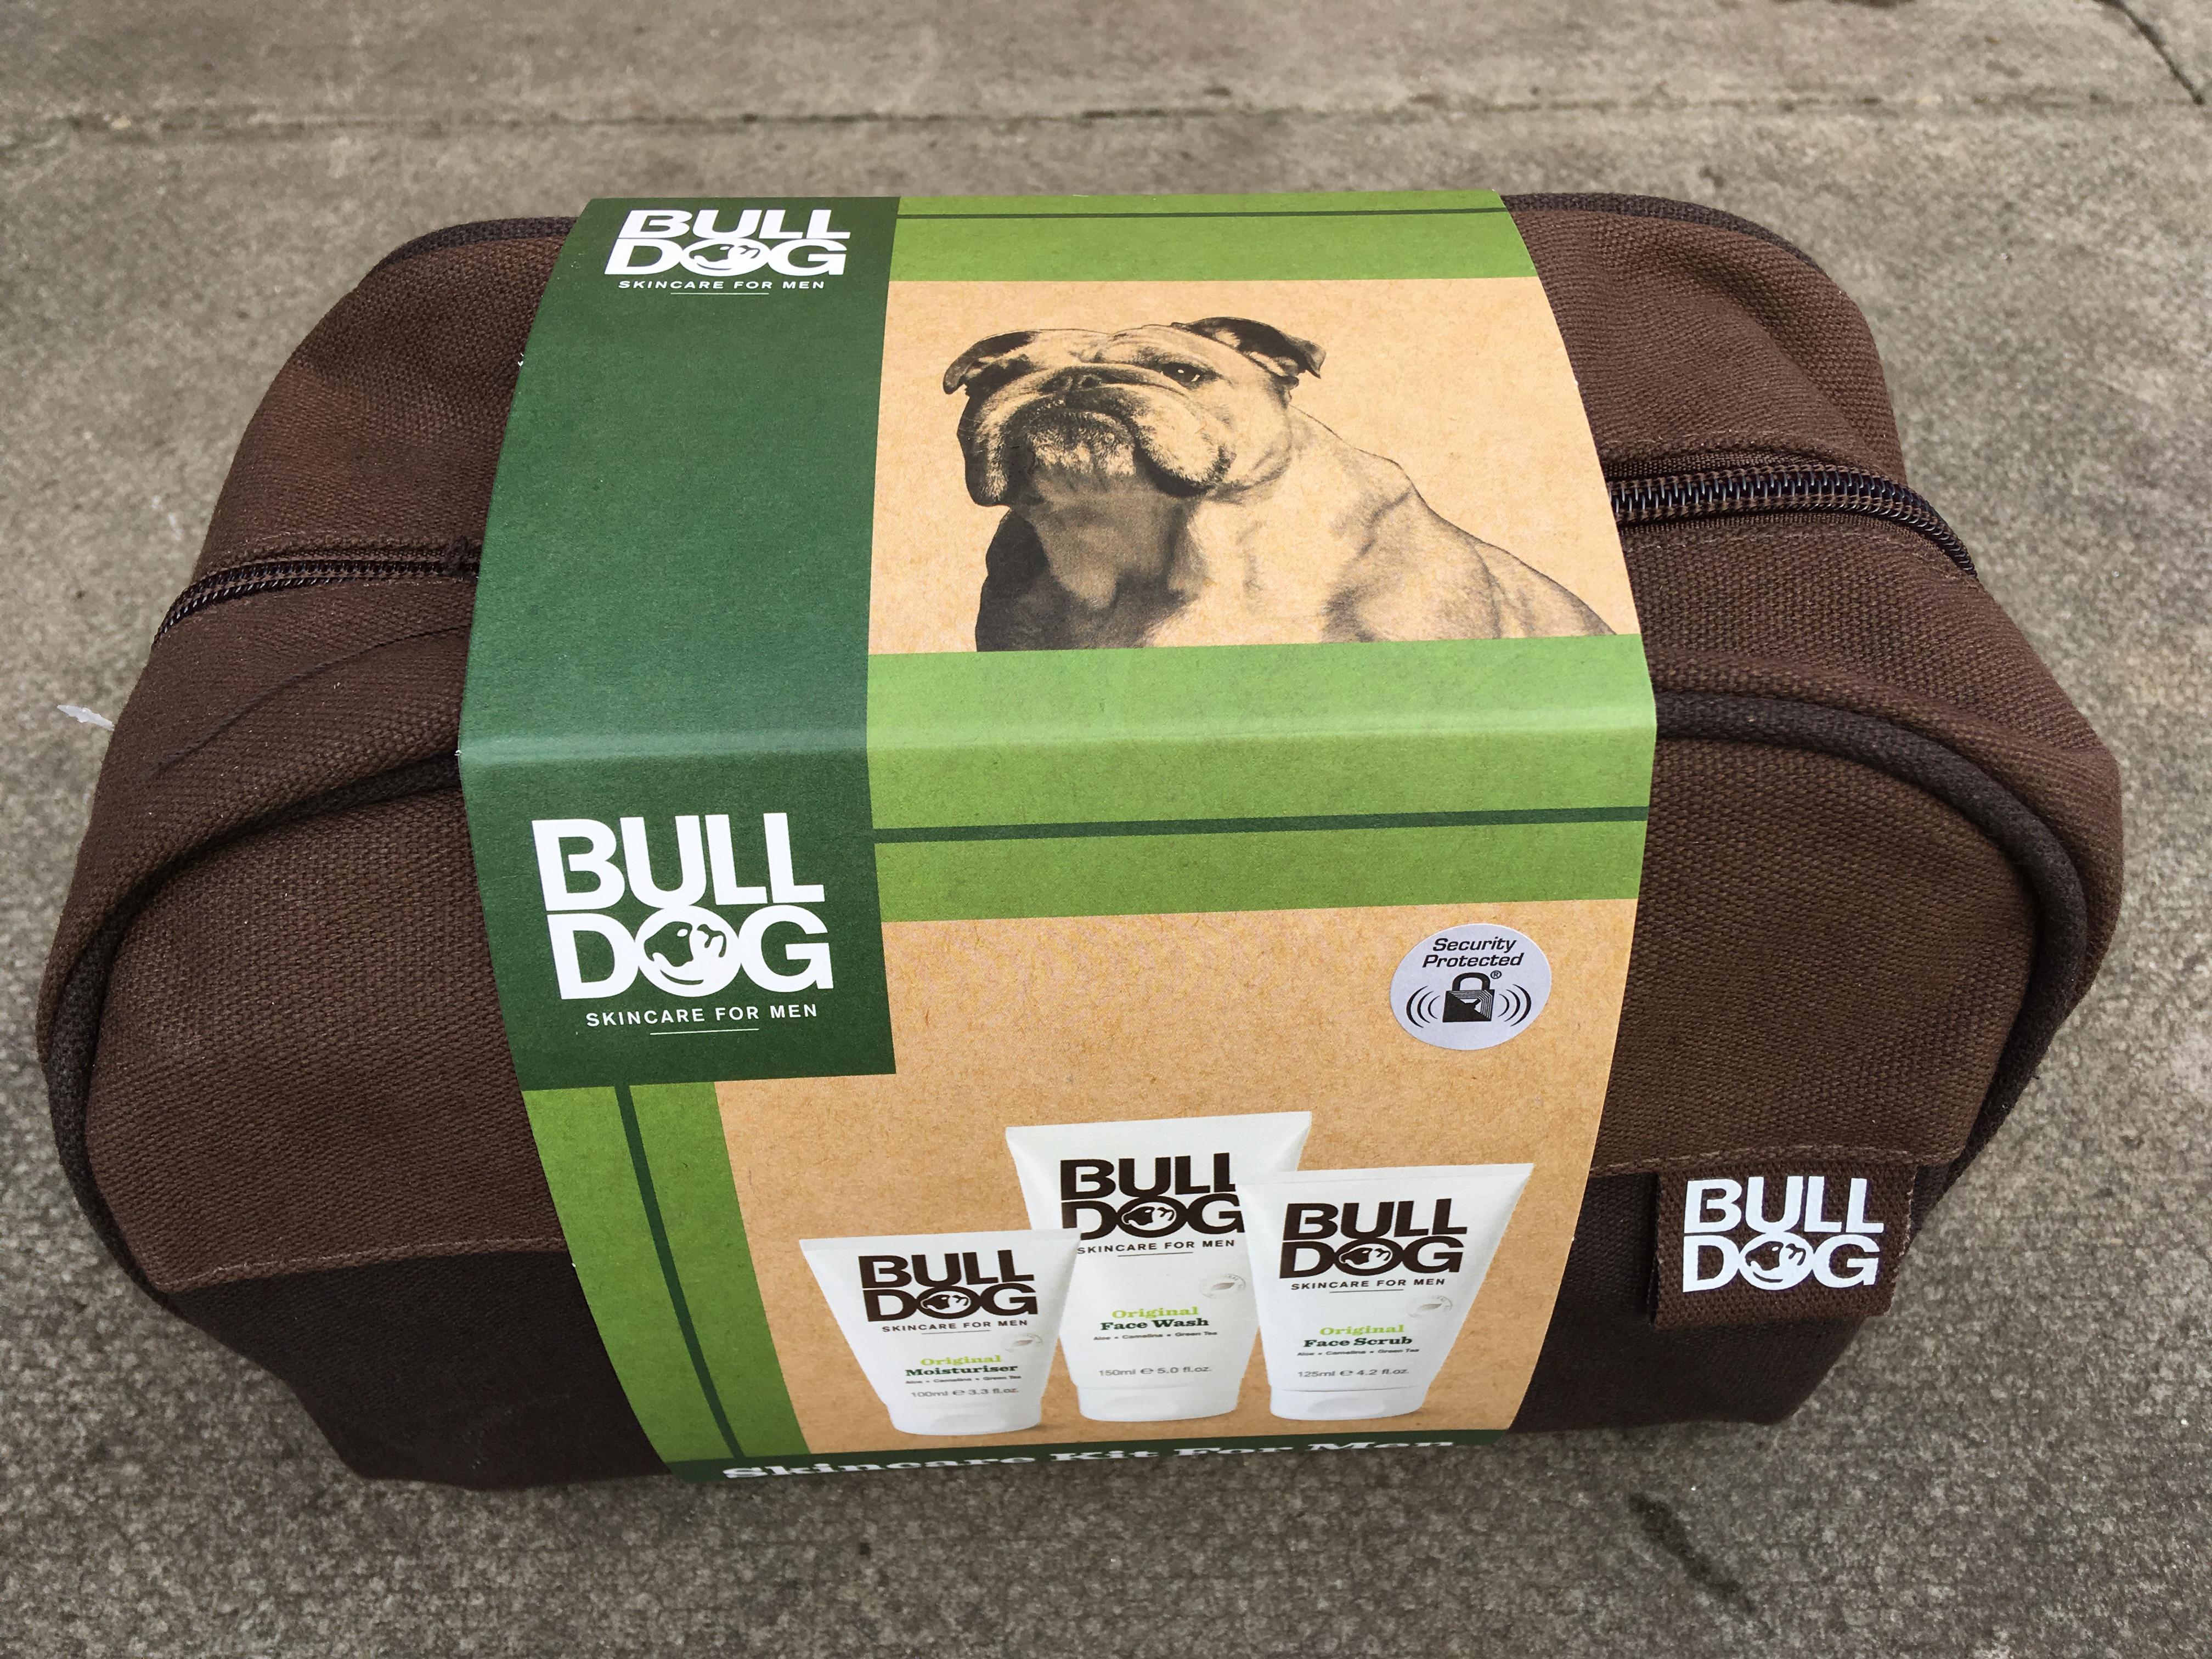 Bulldog 3 in 1 skincare kit + Bag (facewash,scrub and moisturiser) - £7.50 @ Tesco